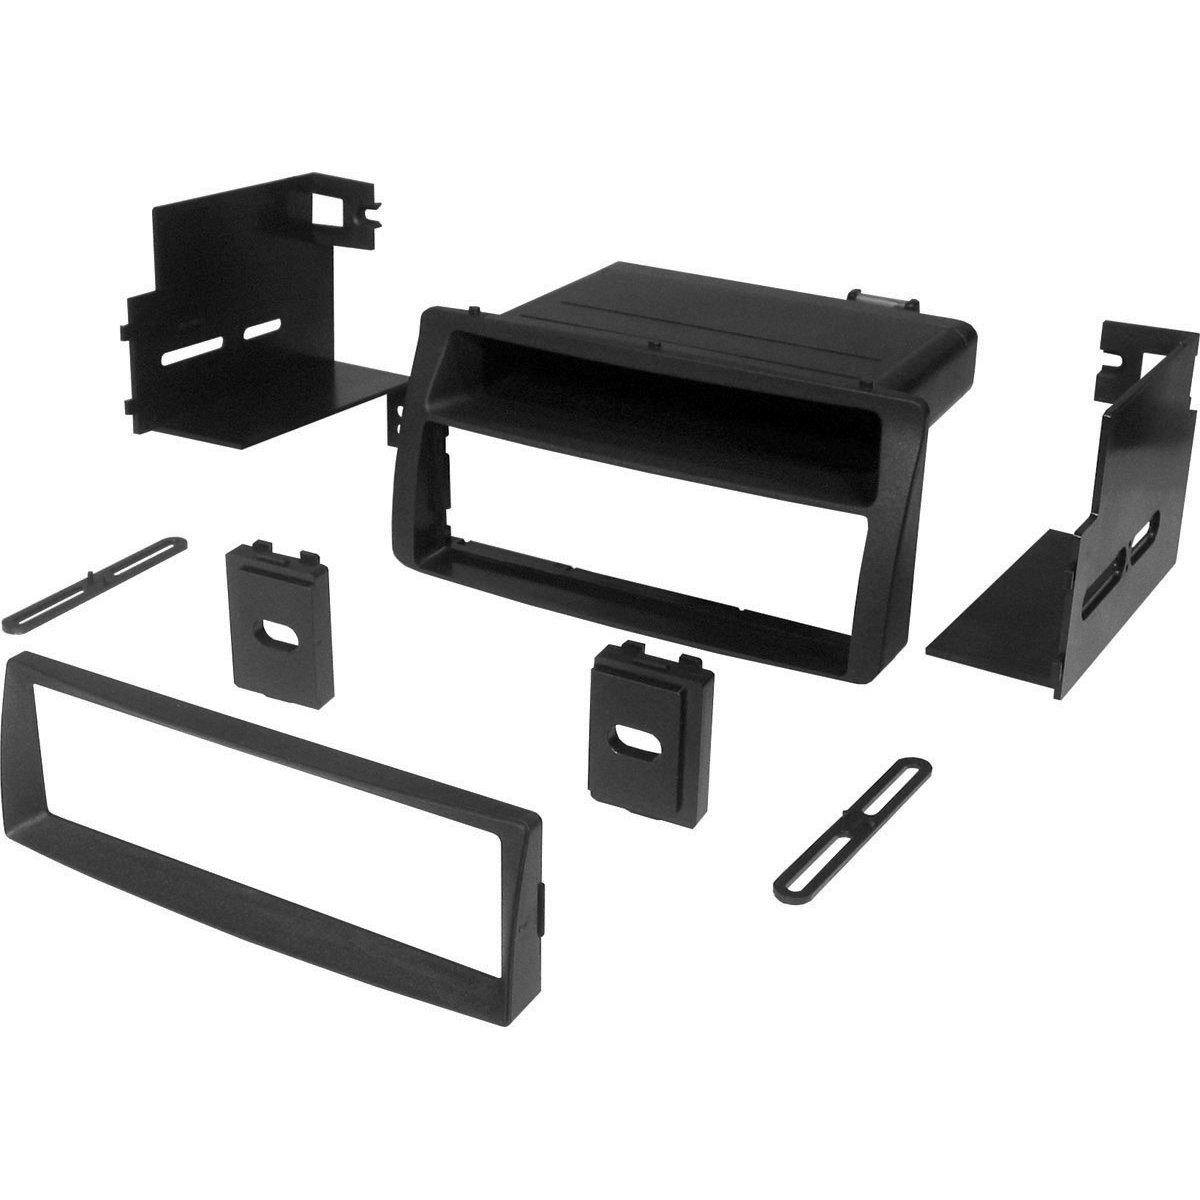 Car Kit Installation Stereo Mounting Dash Install Kit 2003-08 Corolla